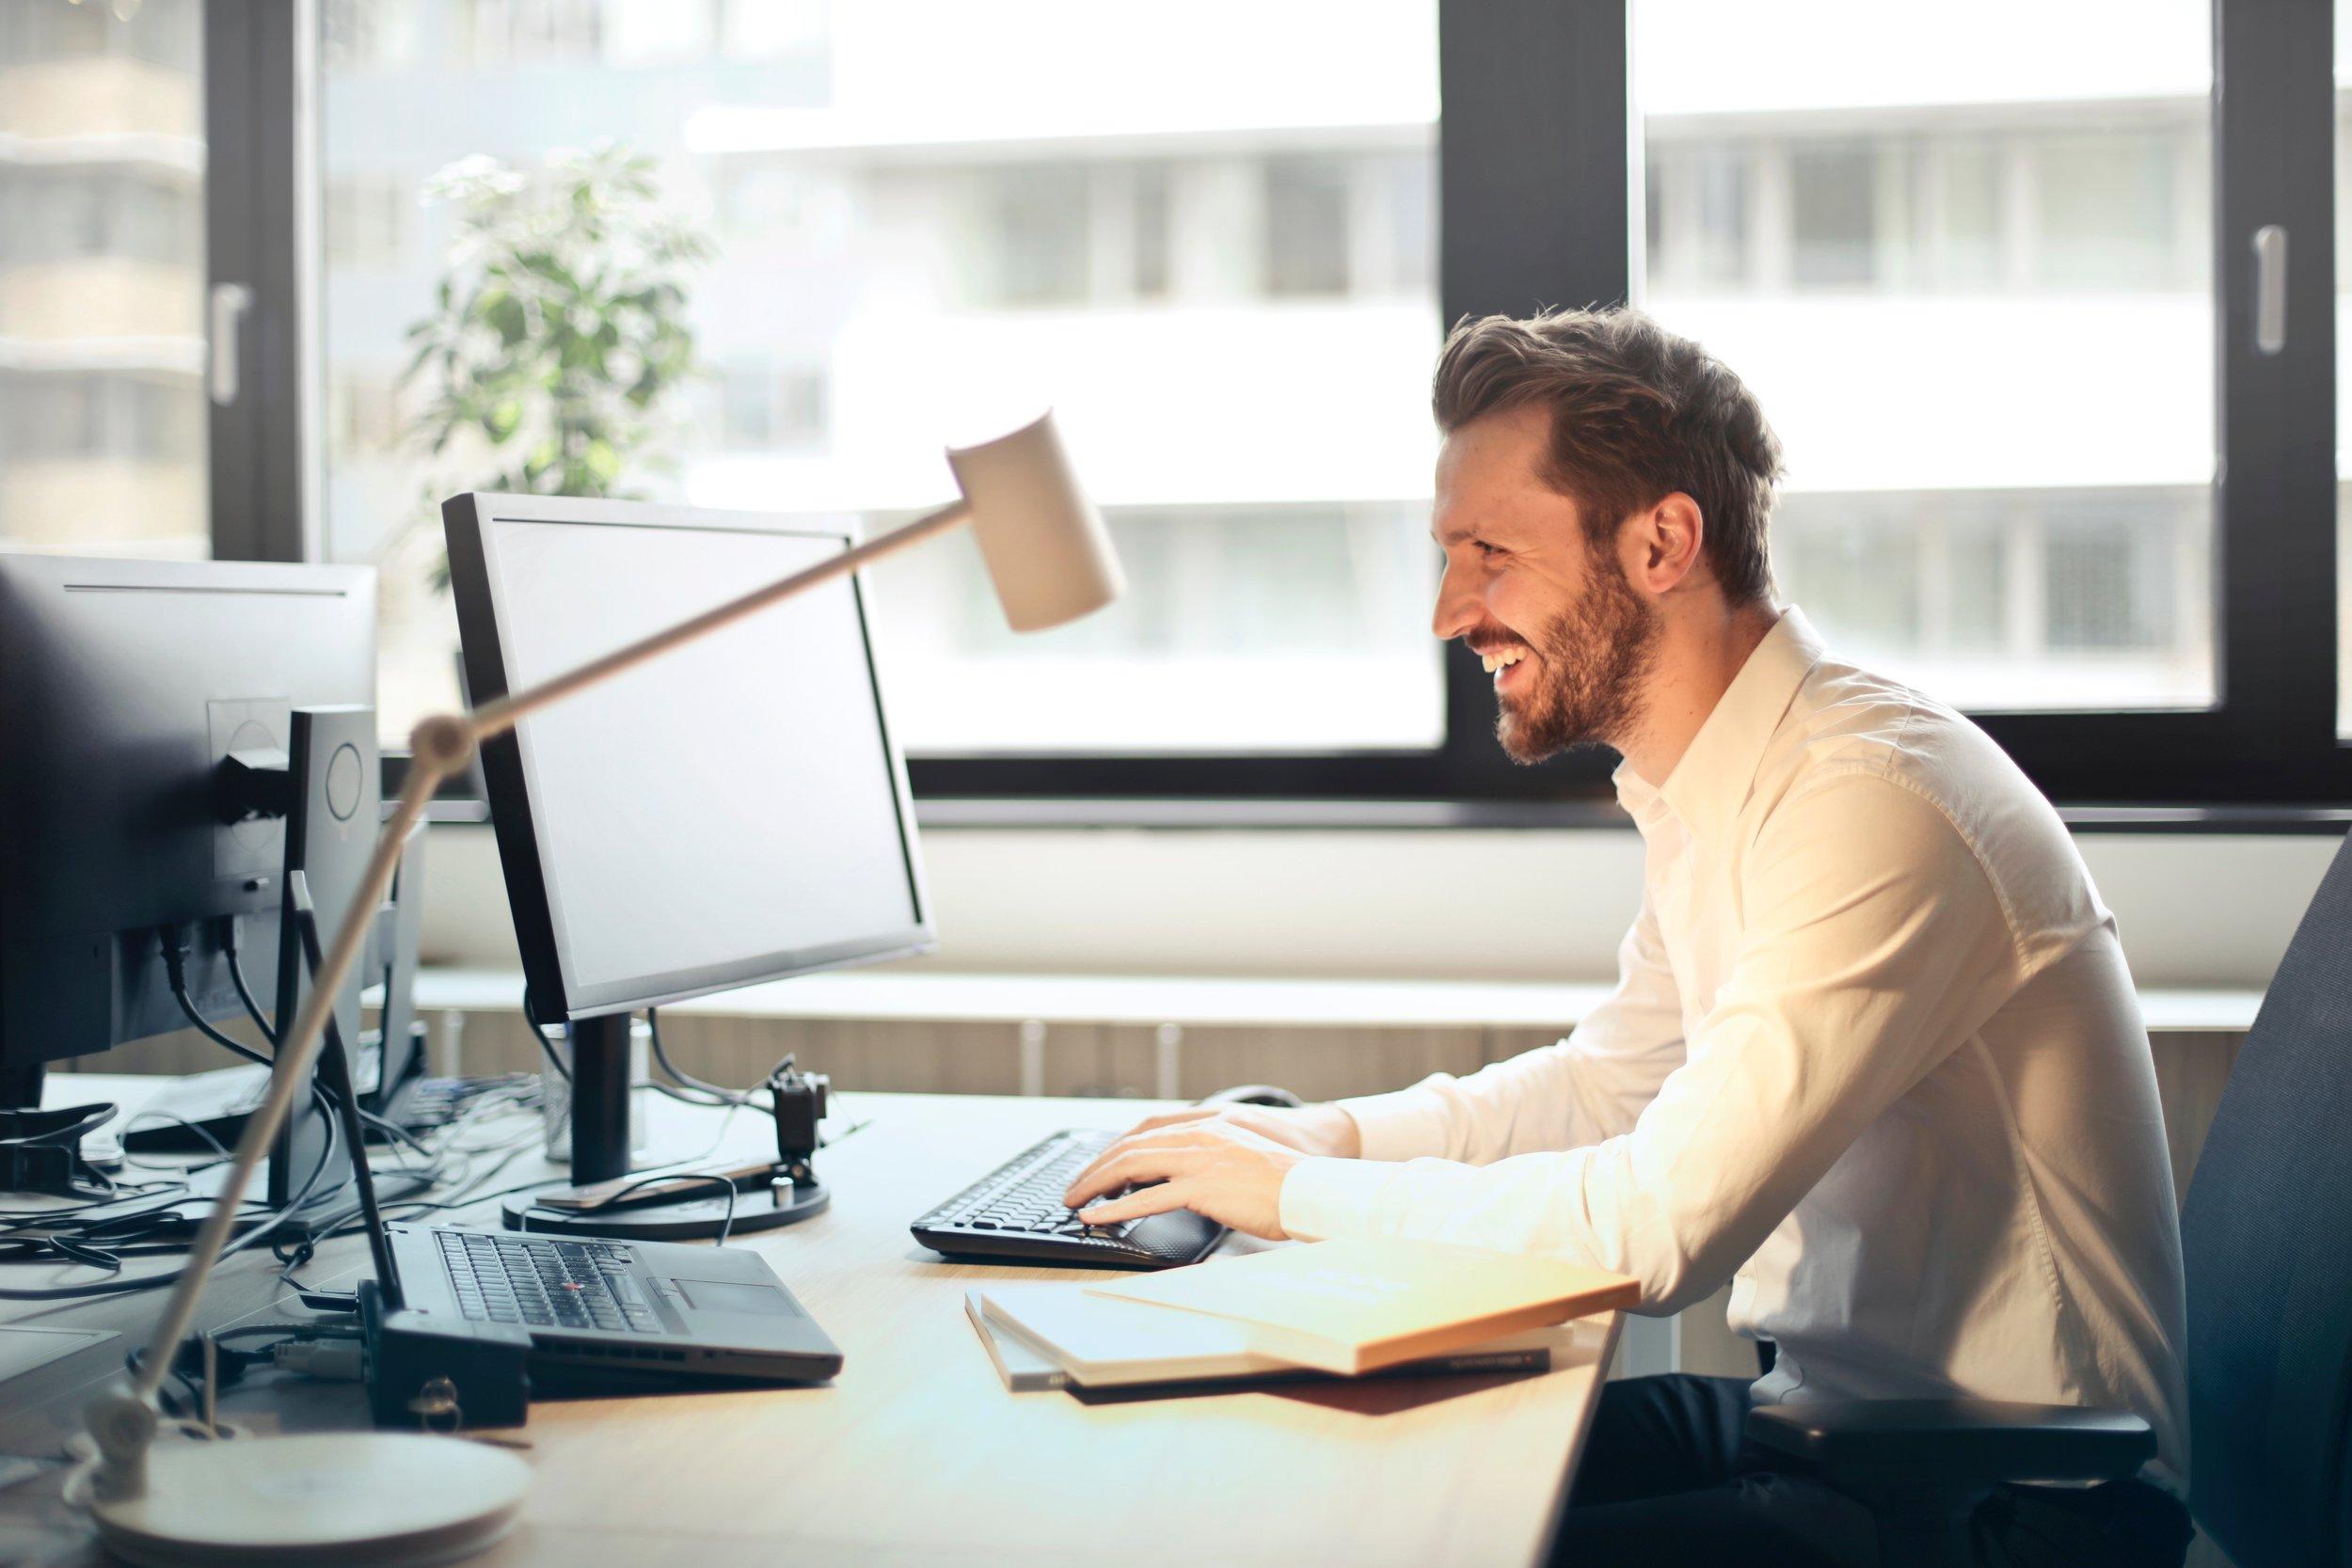 beard-chair-computer-840996.jpg